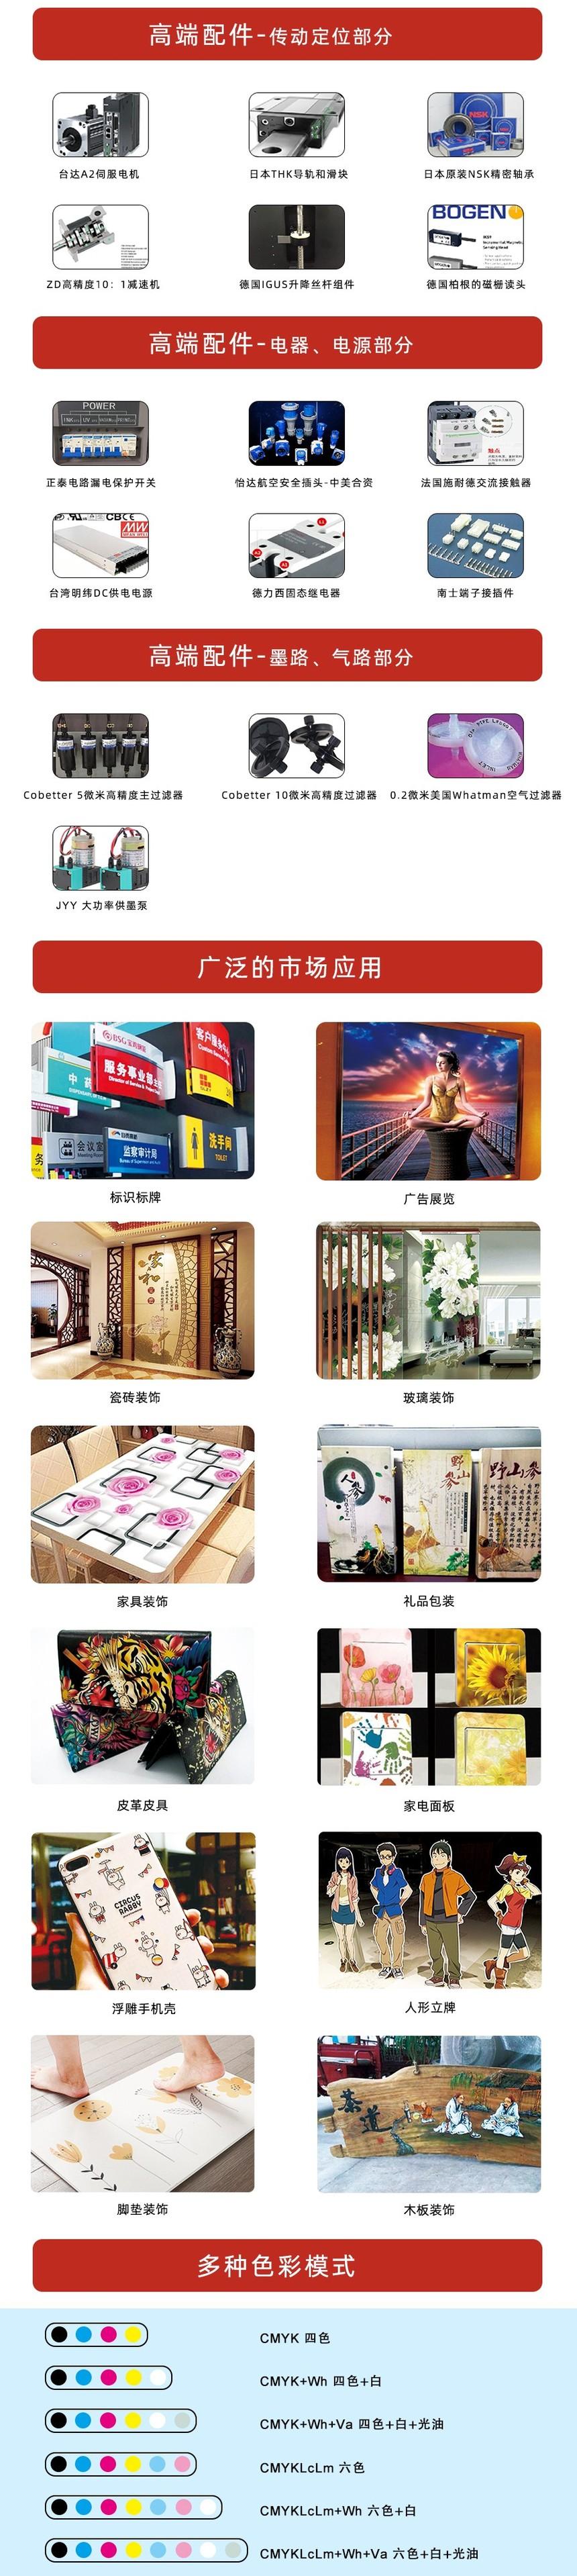 TJ-2513HEX中文产品说明(2).jpg